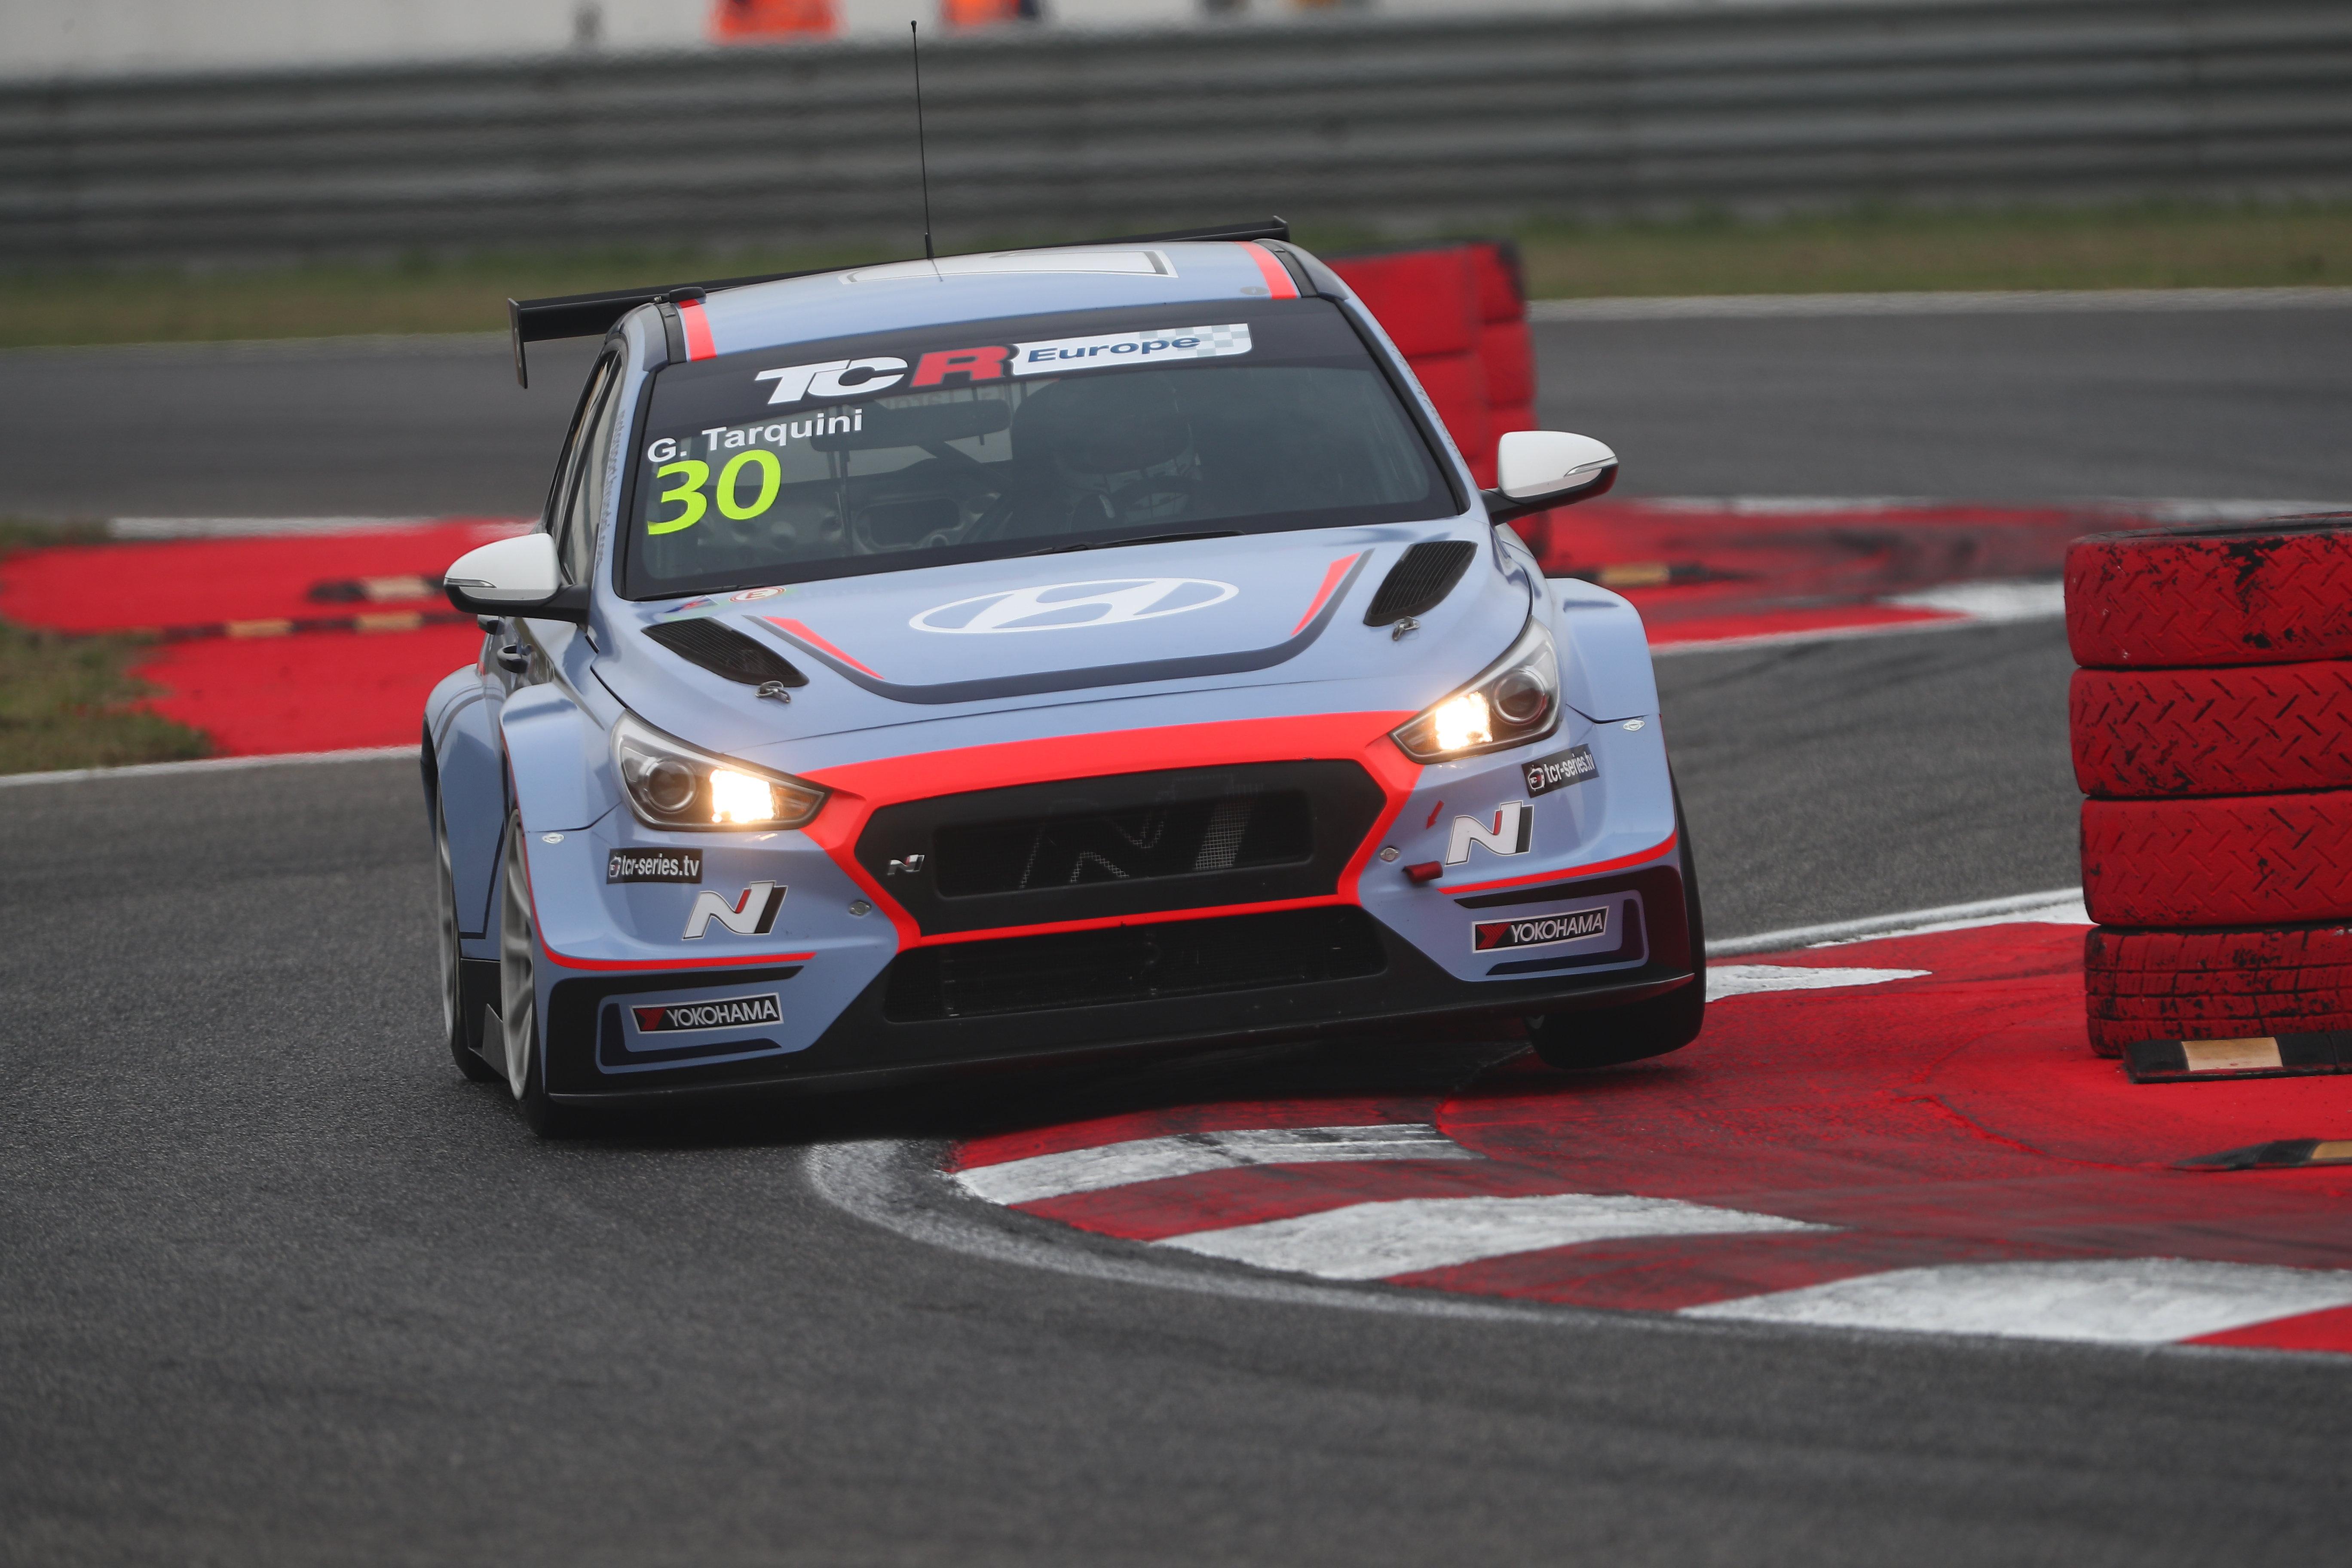 i30 N TCR - Gabriele Tarquini - Adria Raceway